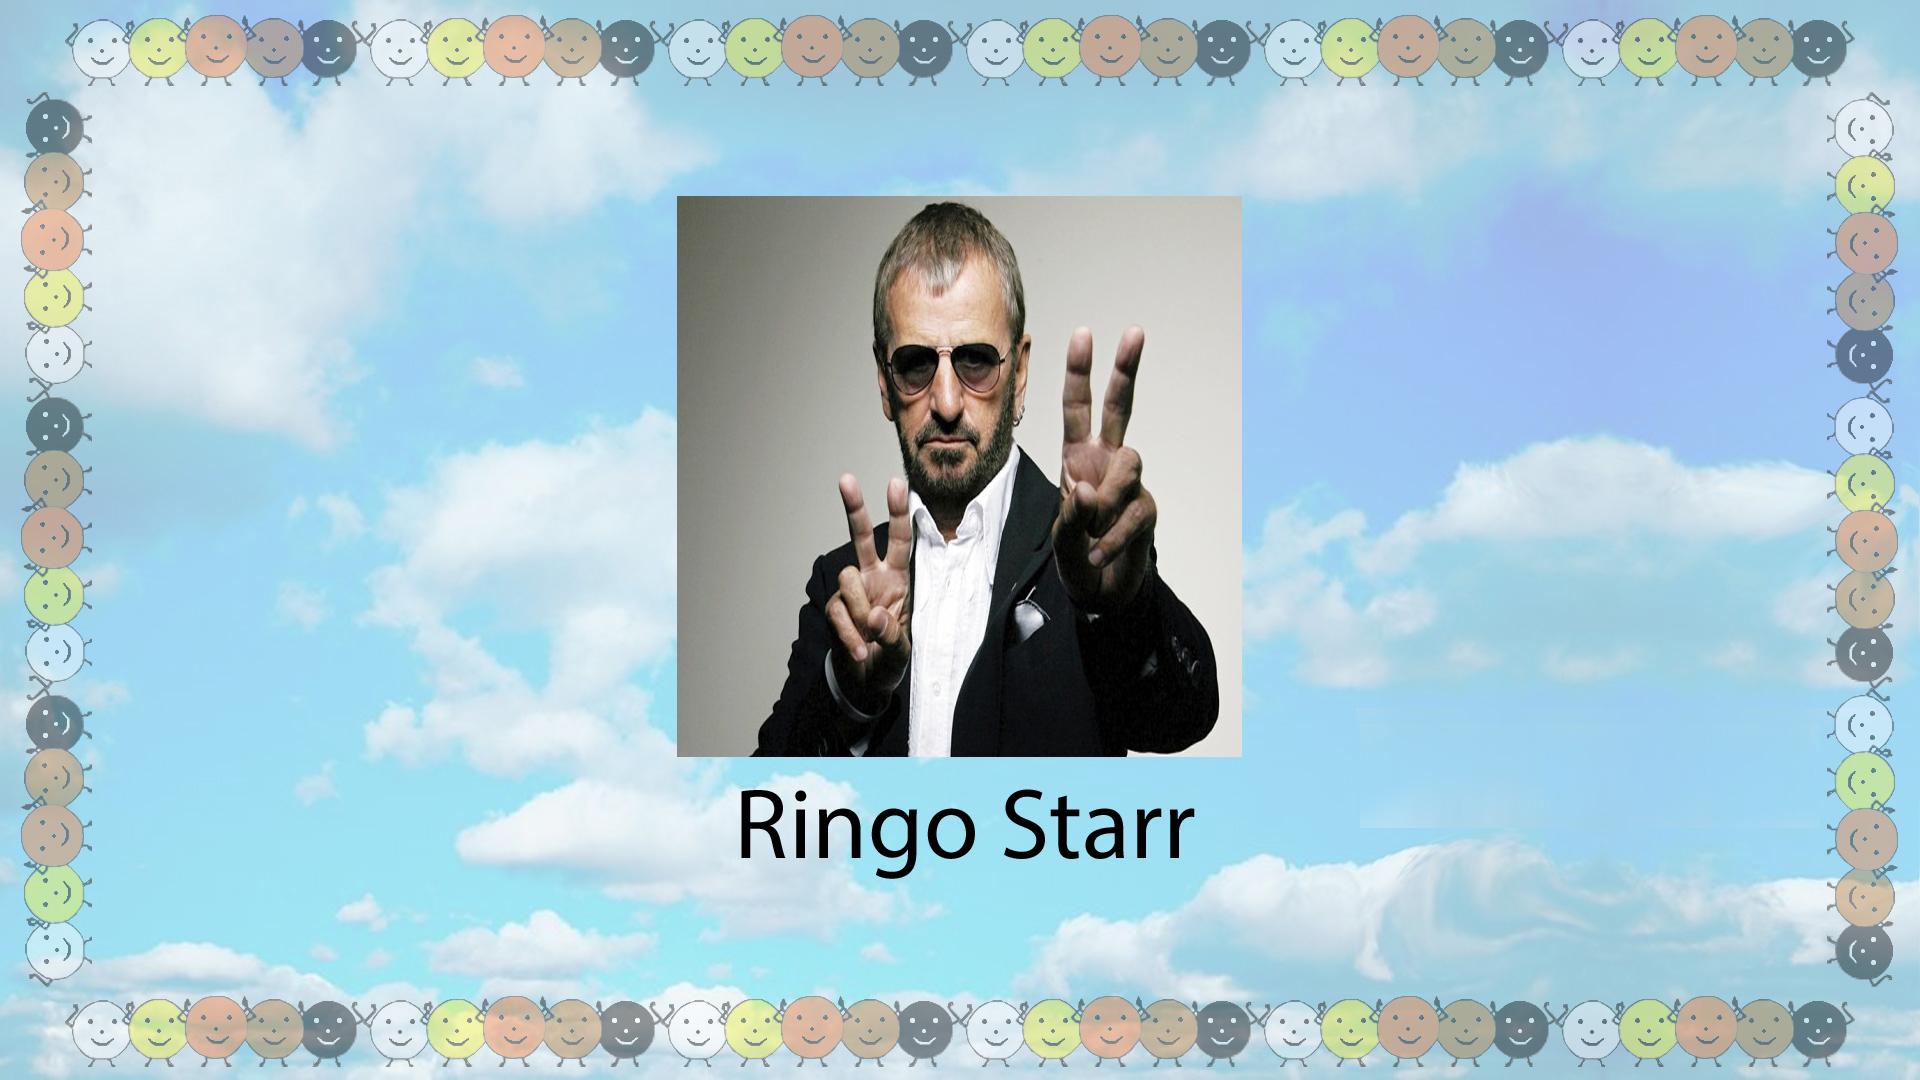 ringo_starr_1